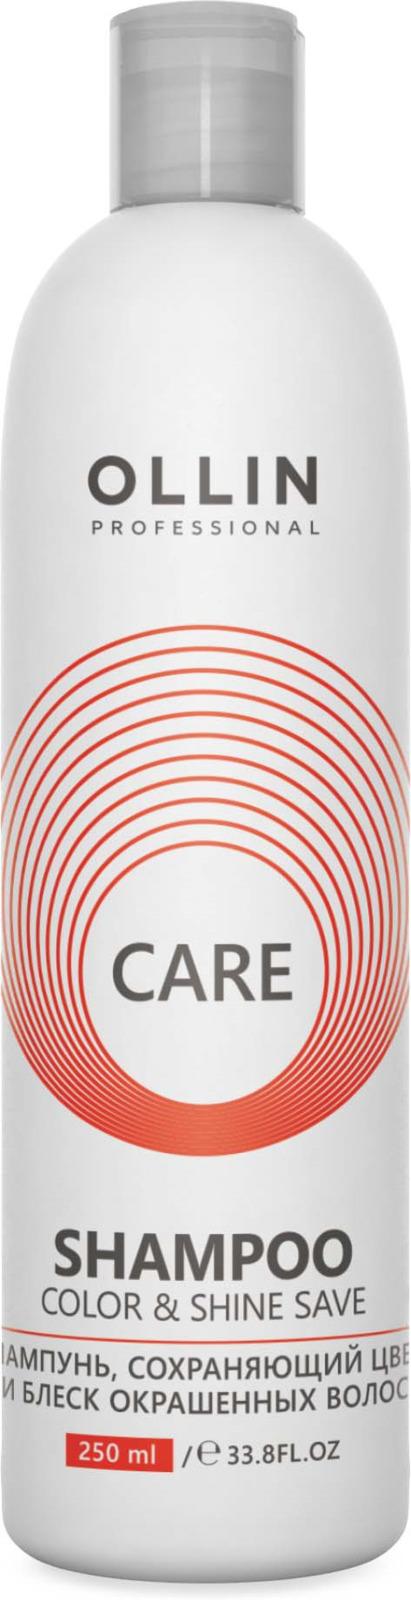 Ollin Шампунь Care Color and Shine Save Shampoo, сохраняющий цвет и блеск окрашенных волос, 250 мл ollin кондиционер сохраняющий цвет и блеск окрашенных волос care color and shine save conditioner 200 мл